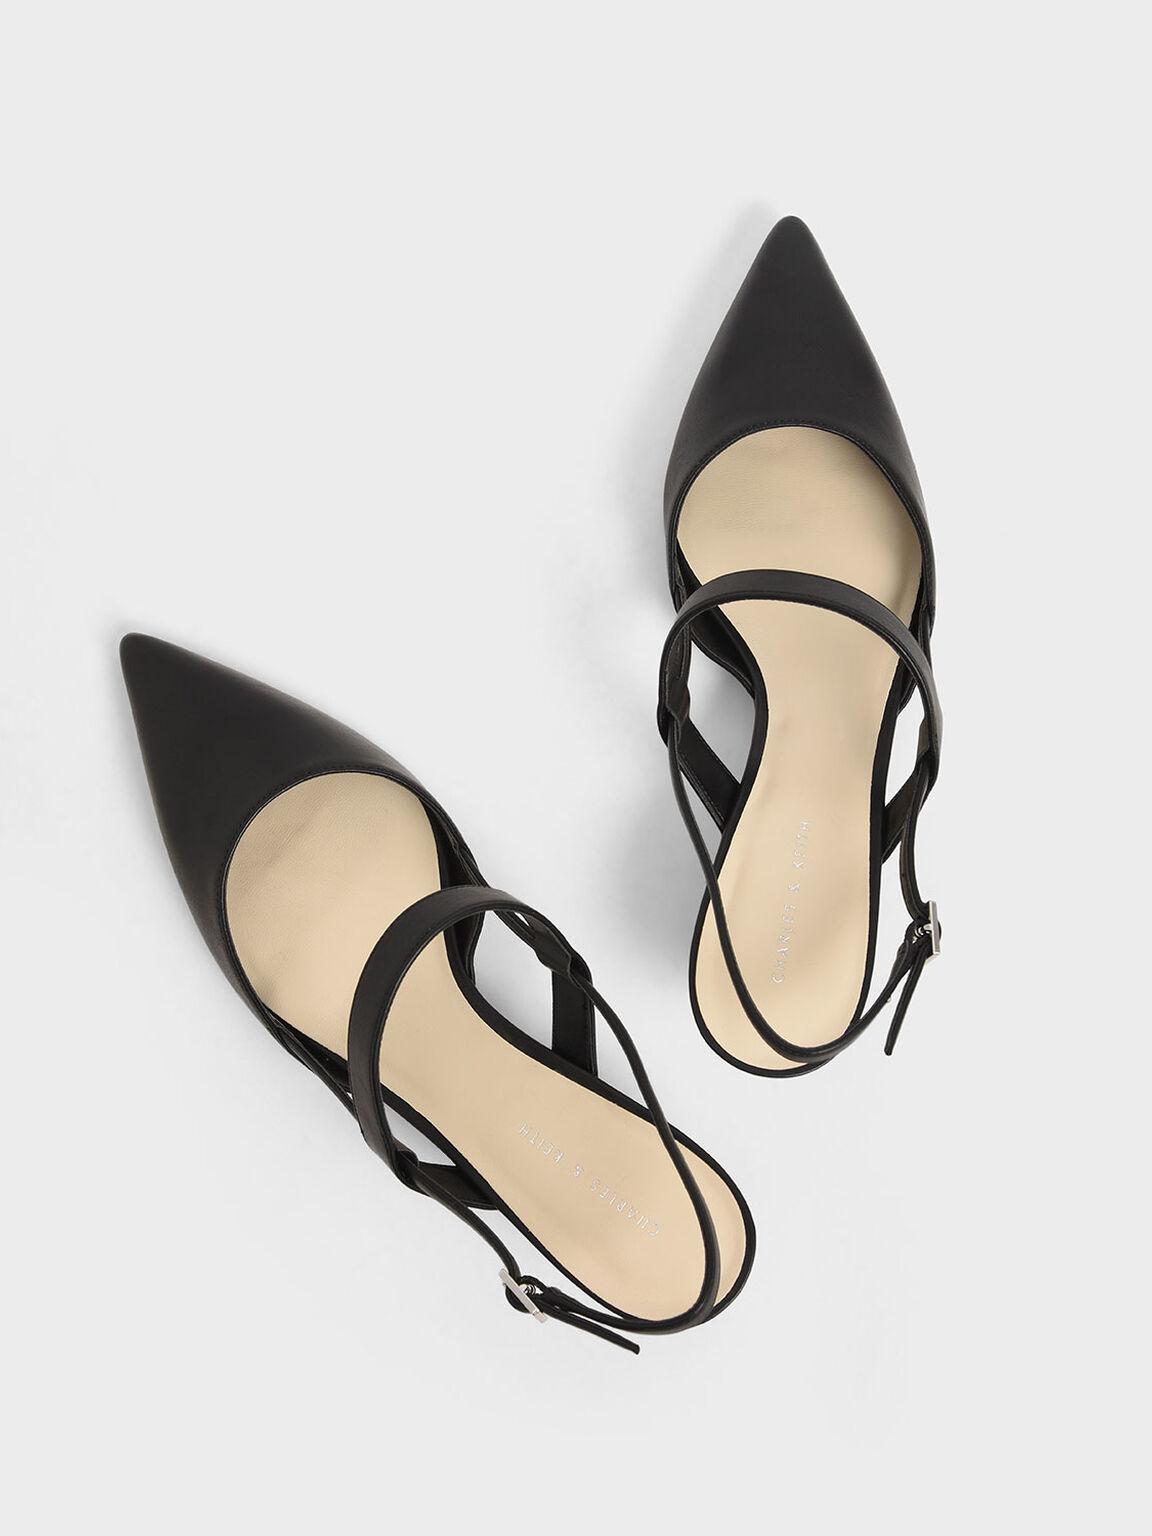 Slingback Kitten Heel Pumps, Black, hi-res